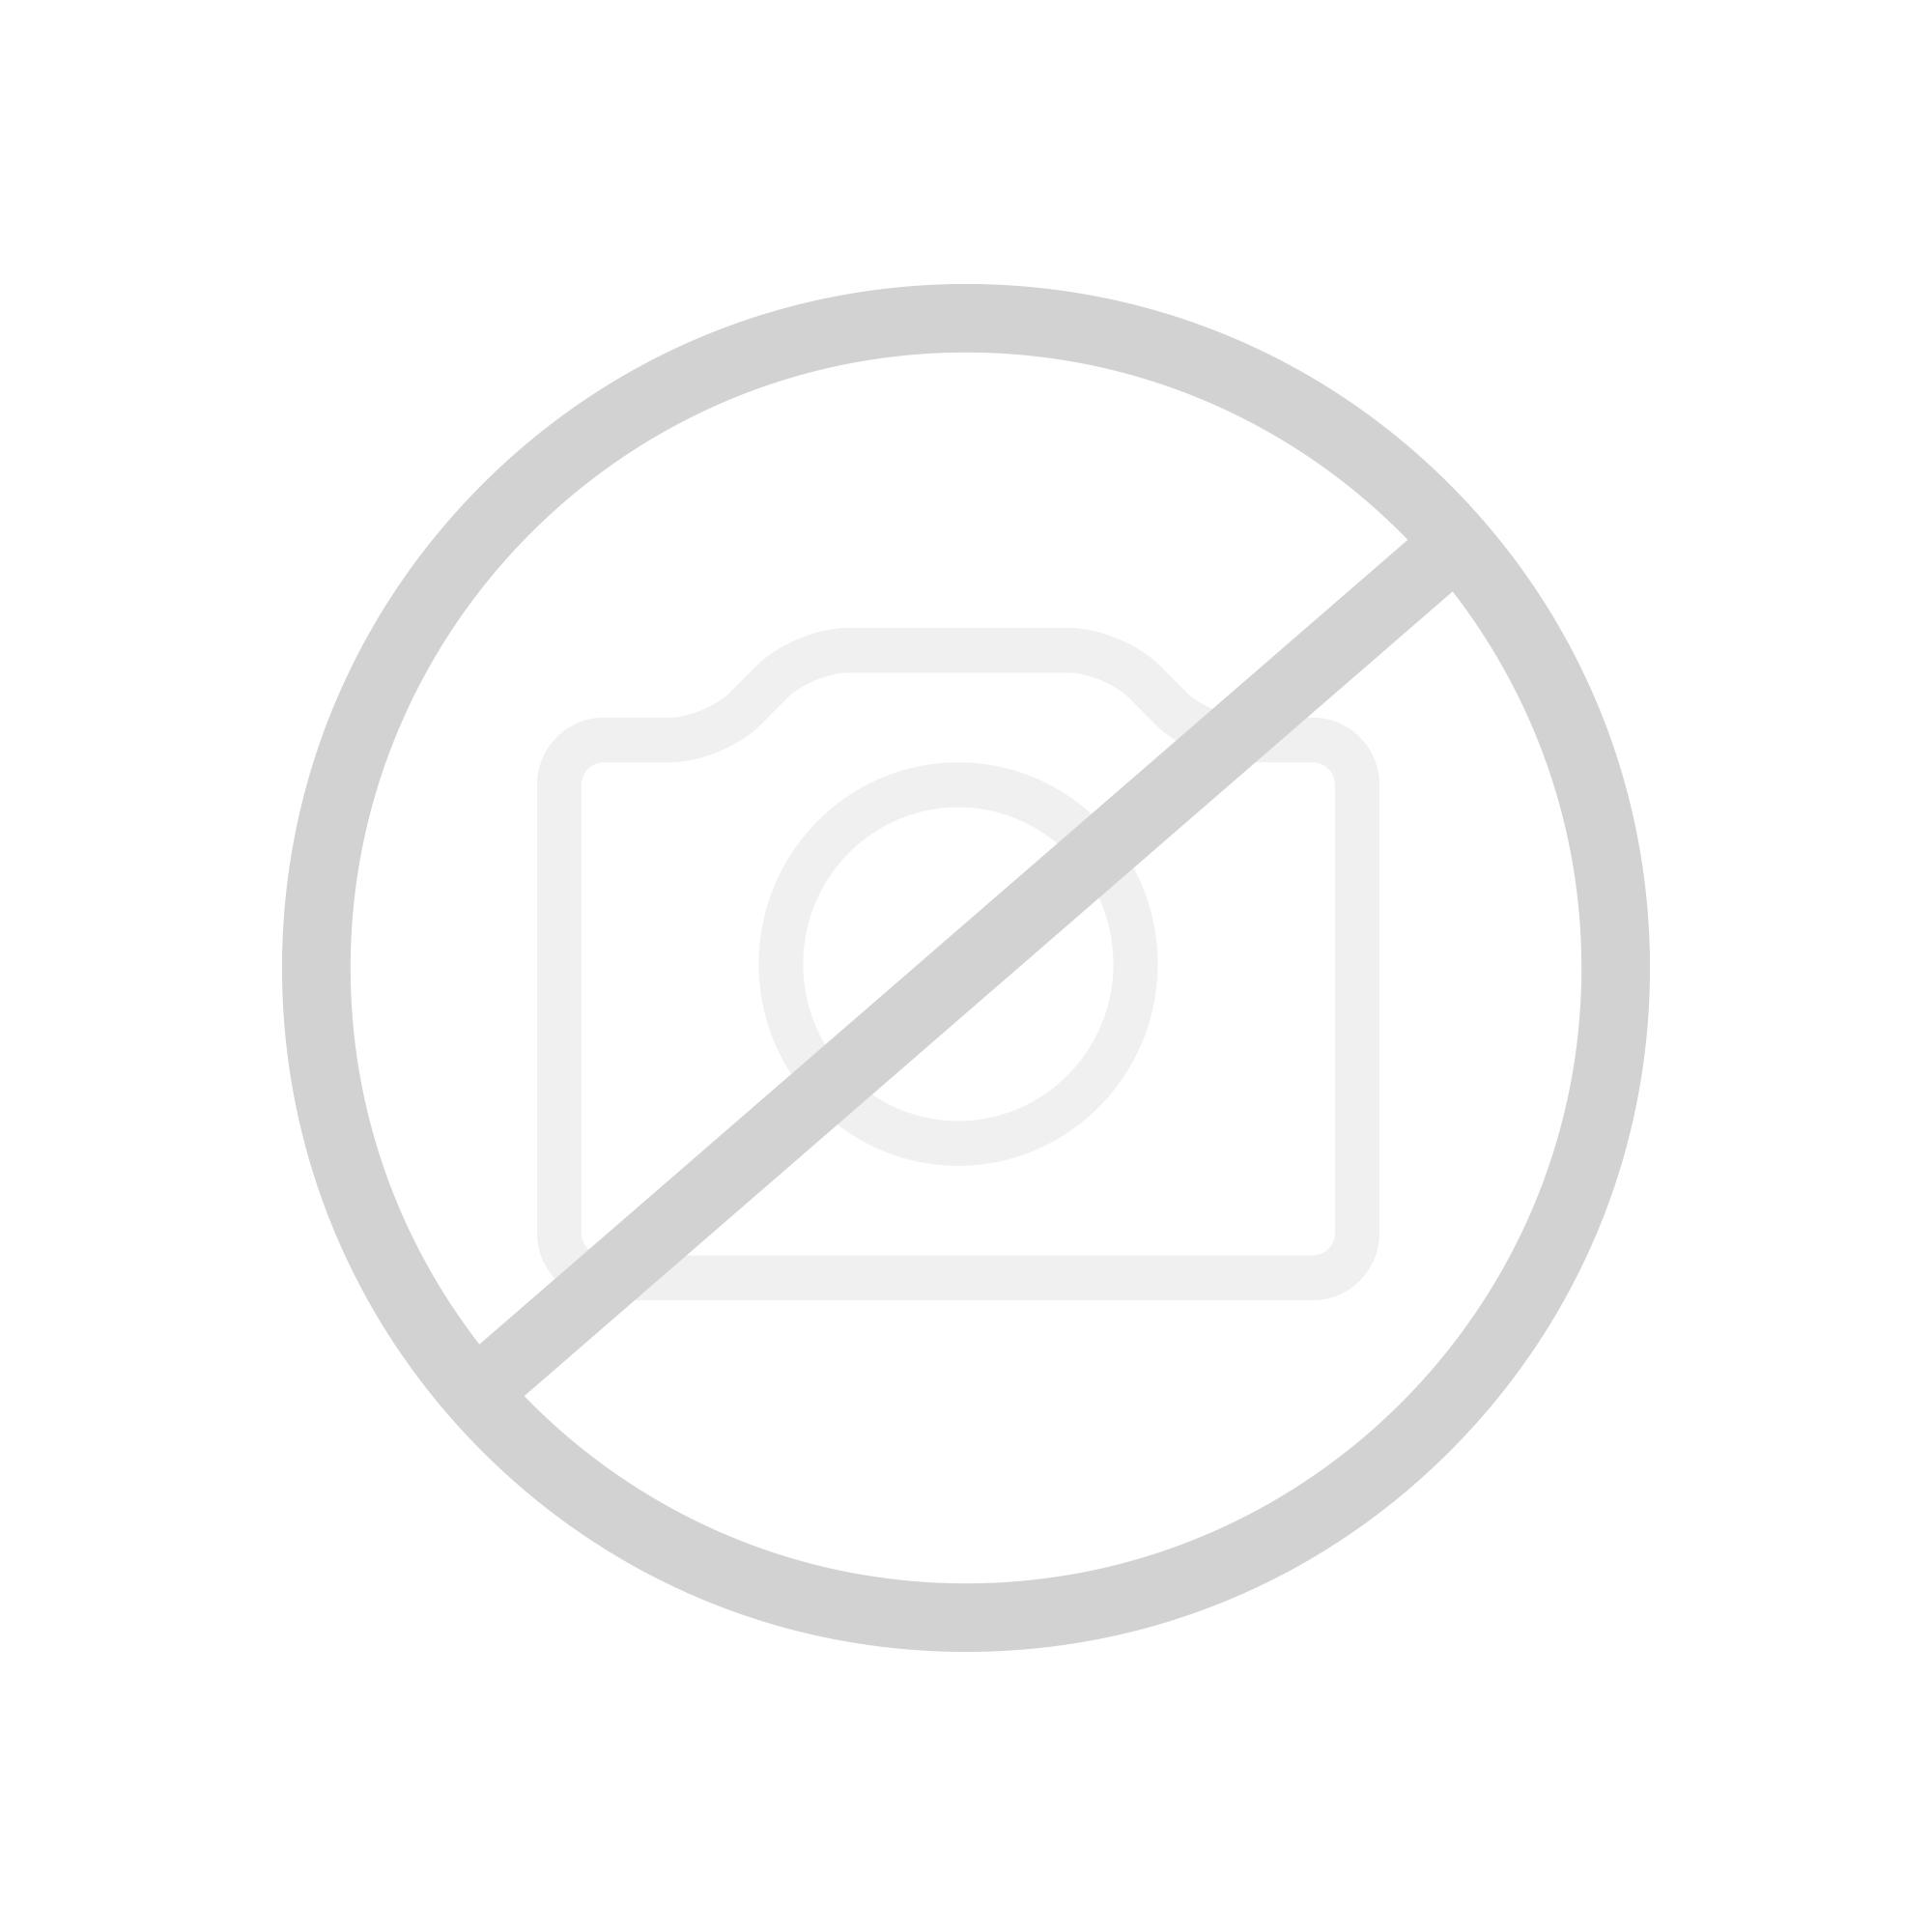 keuco moll handtuchhaken 12715010000 reuter onlineshop. Black Bedroom Furniture Sets. Home Design Ideas